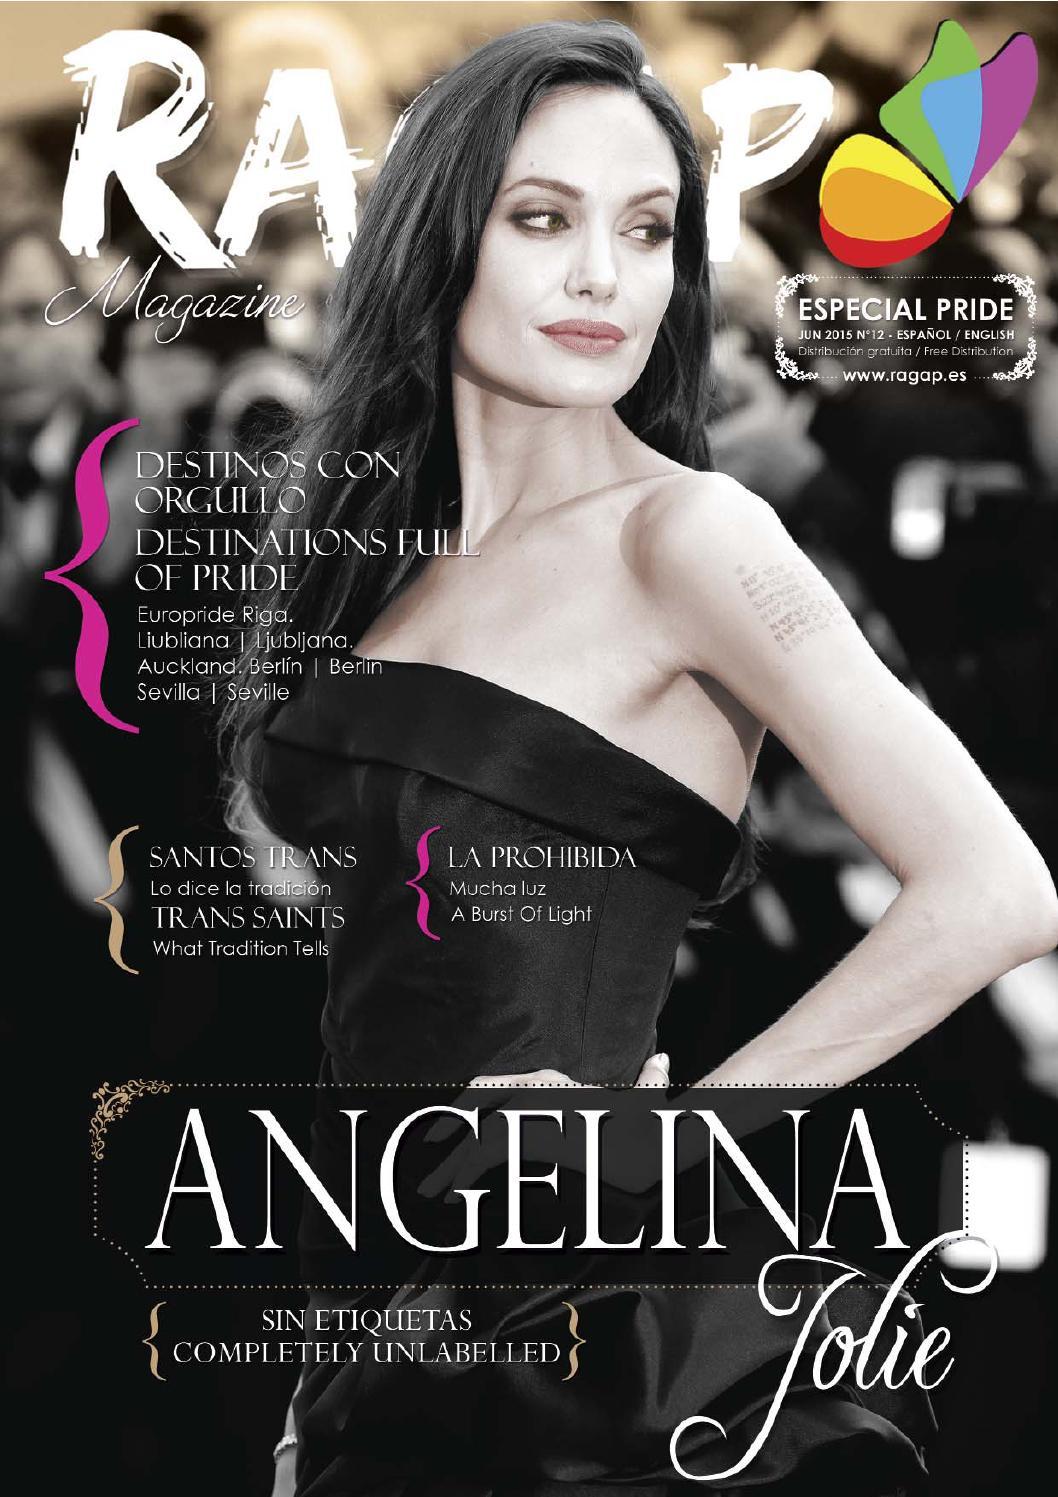 Actor Porno Español Ex Falete ragap magazine pride 2015ragap - issuu